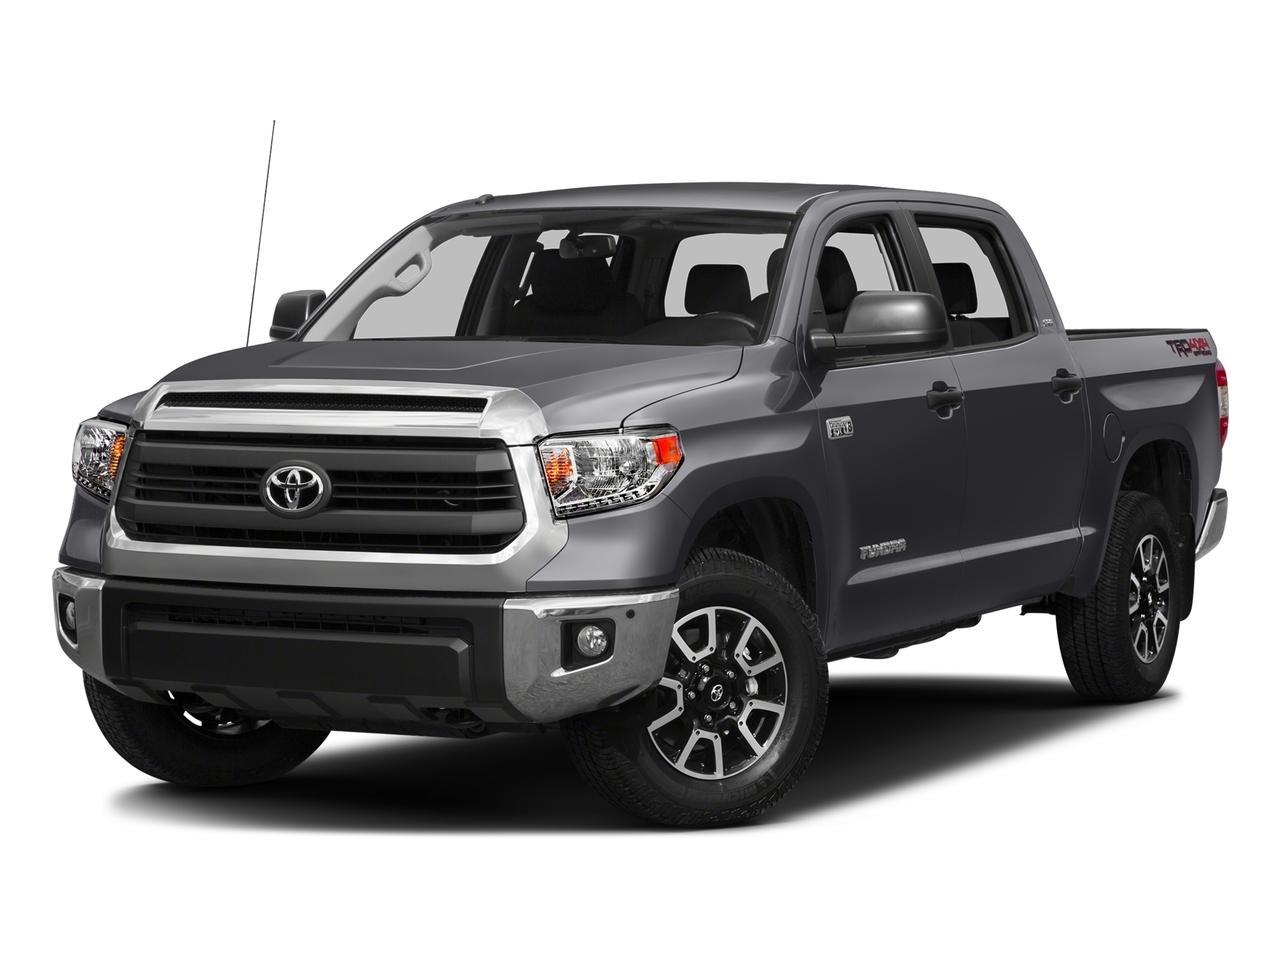 2016 Toyota Tundra 2WD Truck Vehicle Photo in Austin, TX 78759